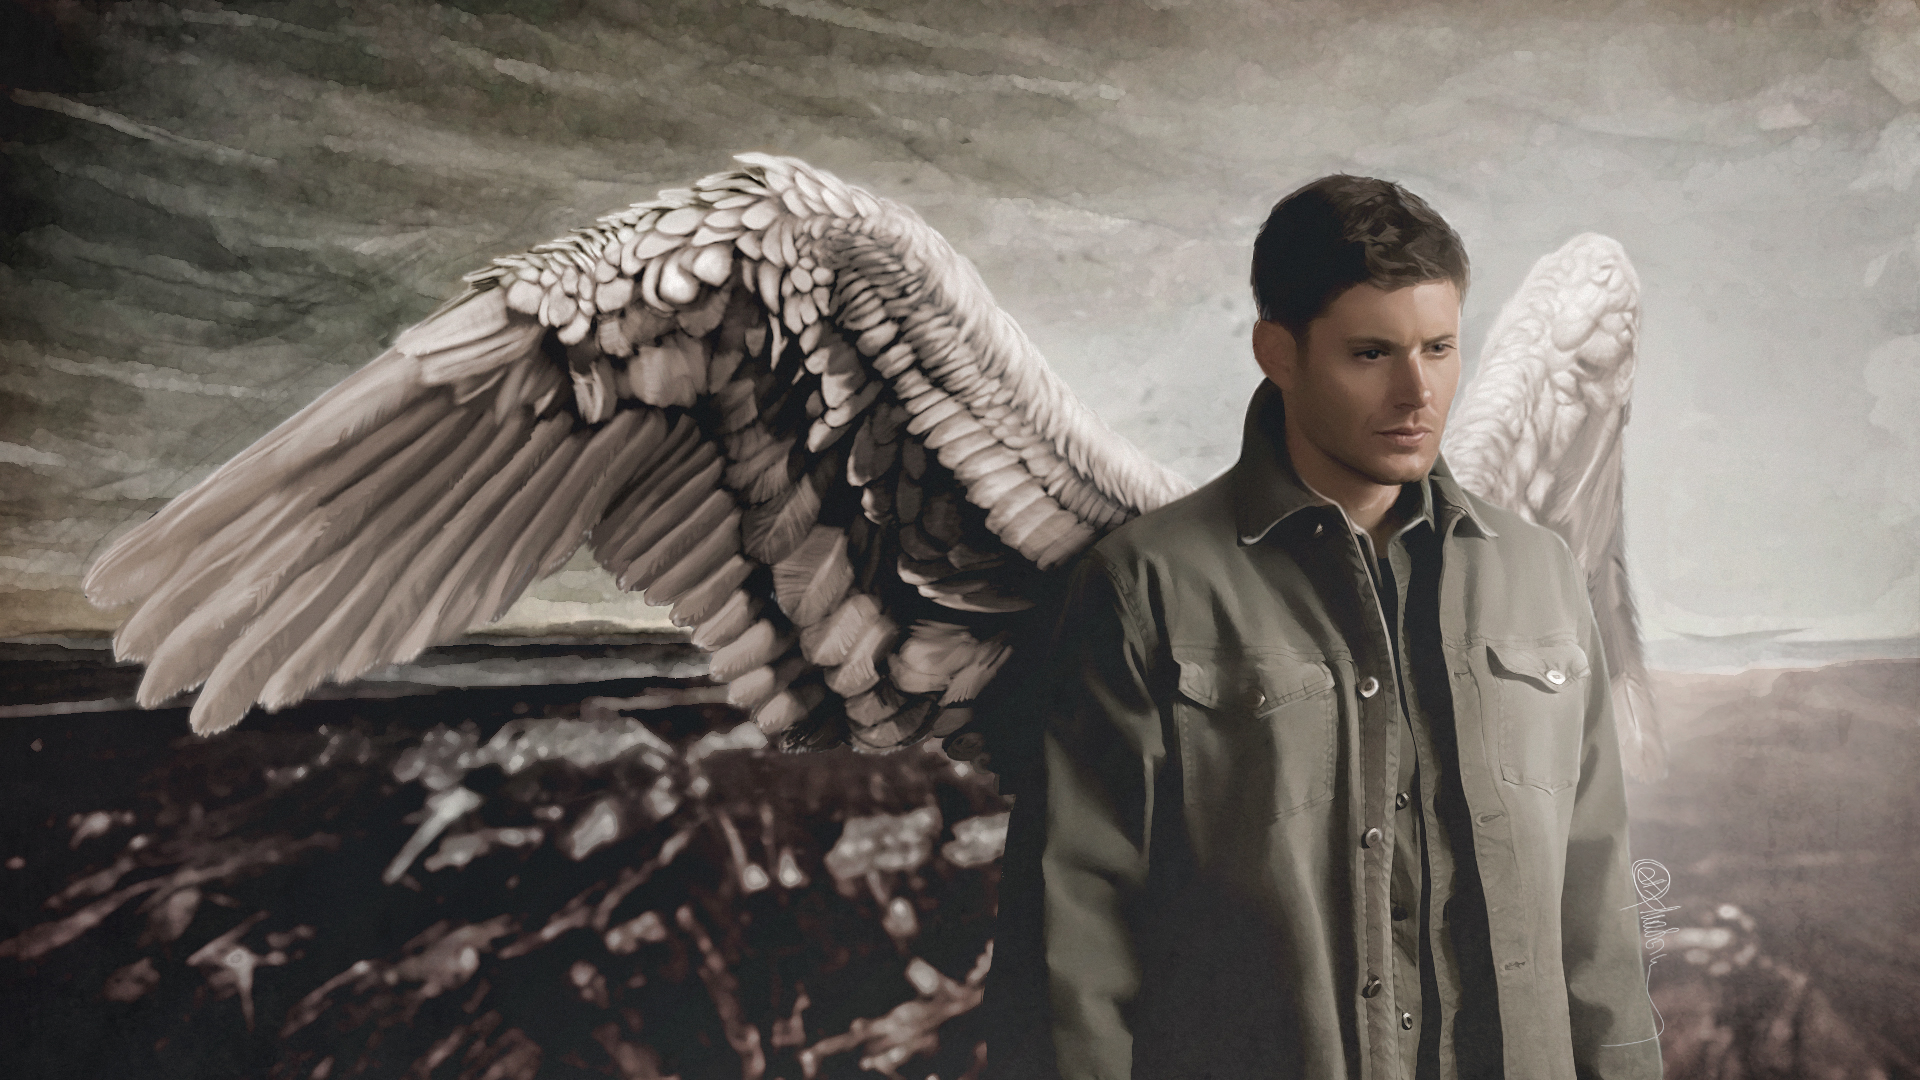 Supernatural Wallpaper Laptop Posted By Samantha Johnson